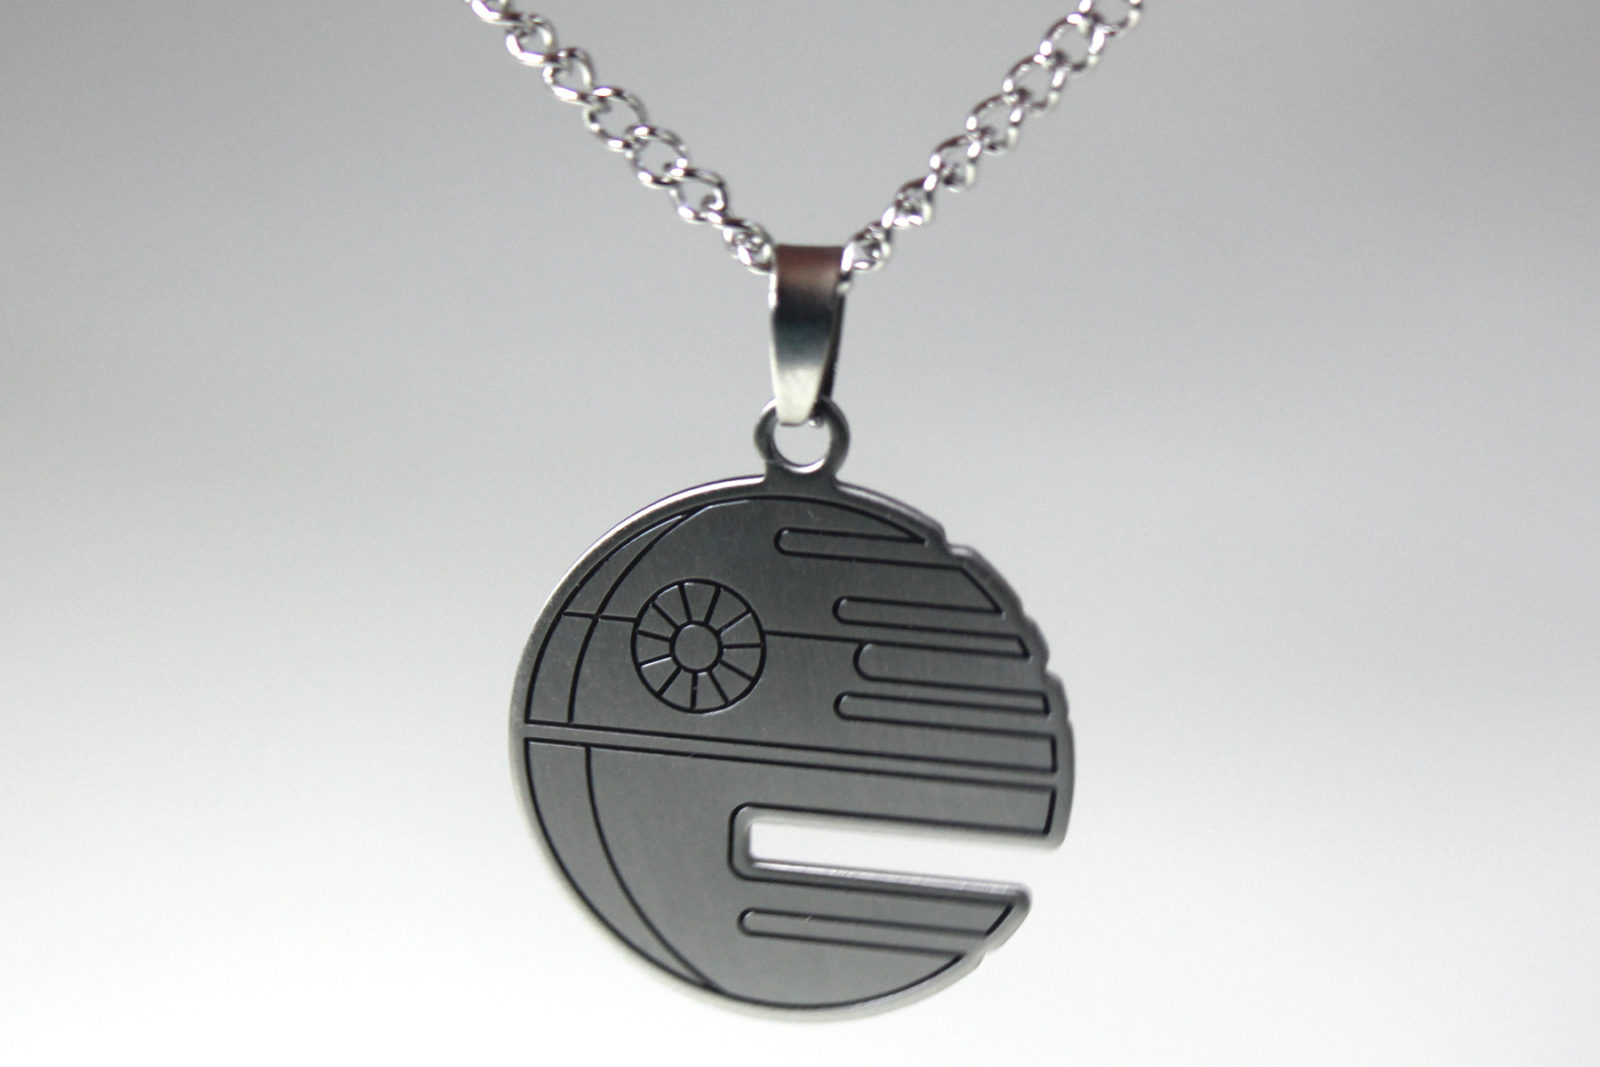 Bodyvibe - Death Star cutout pendant necklace